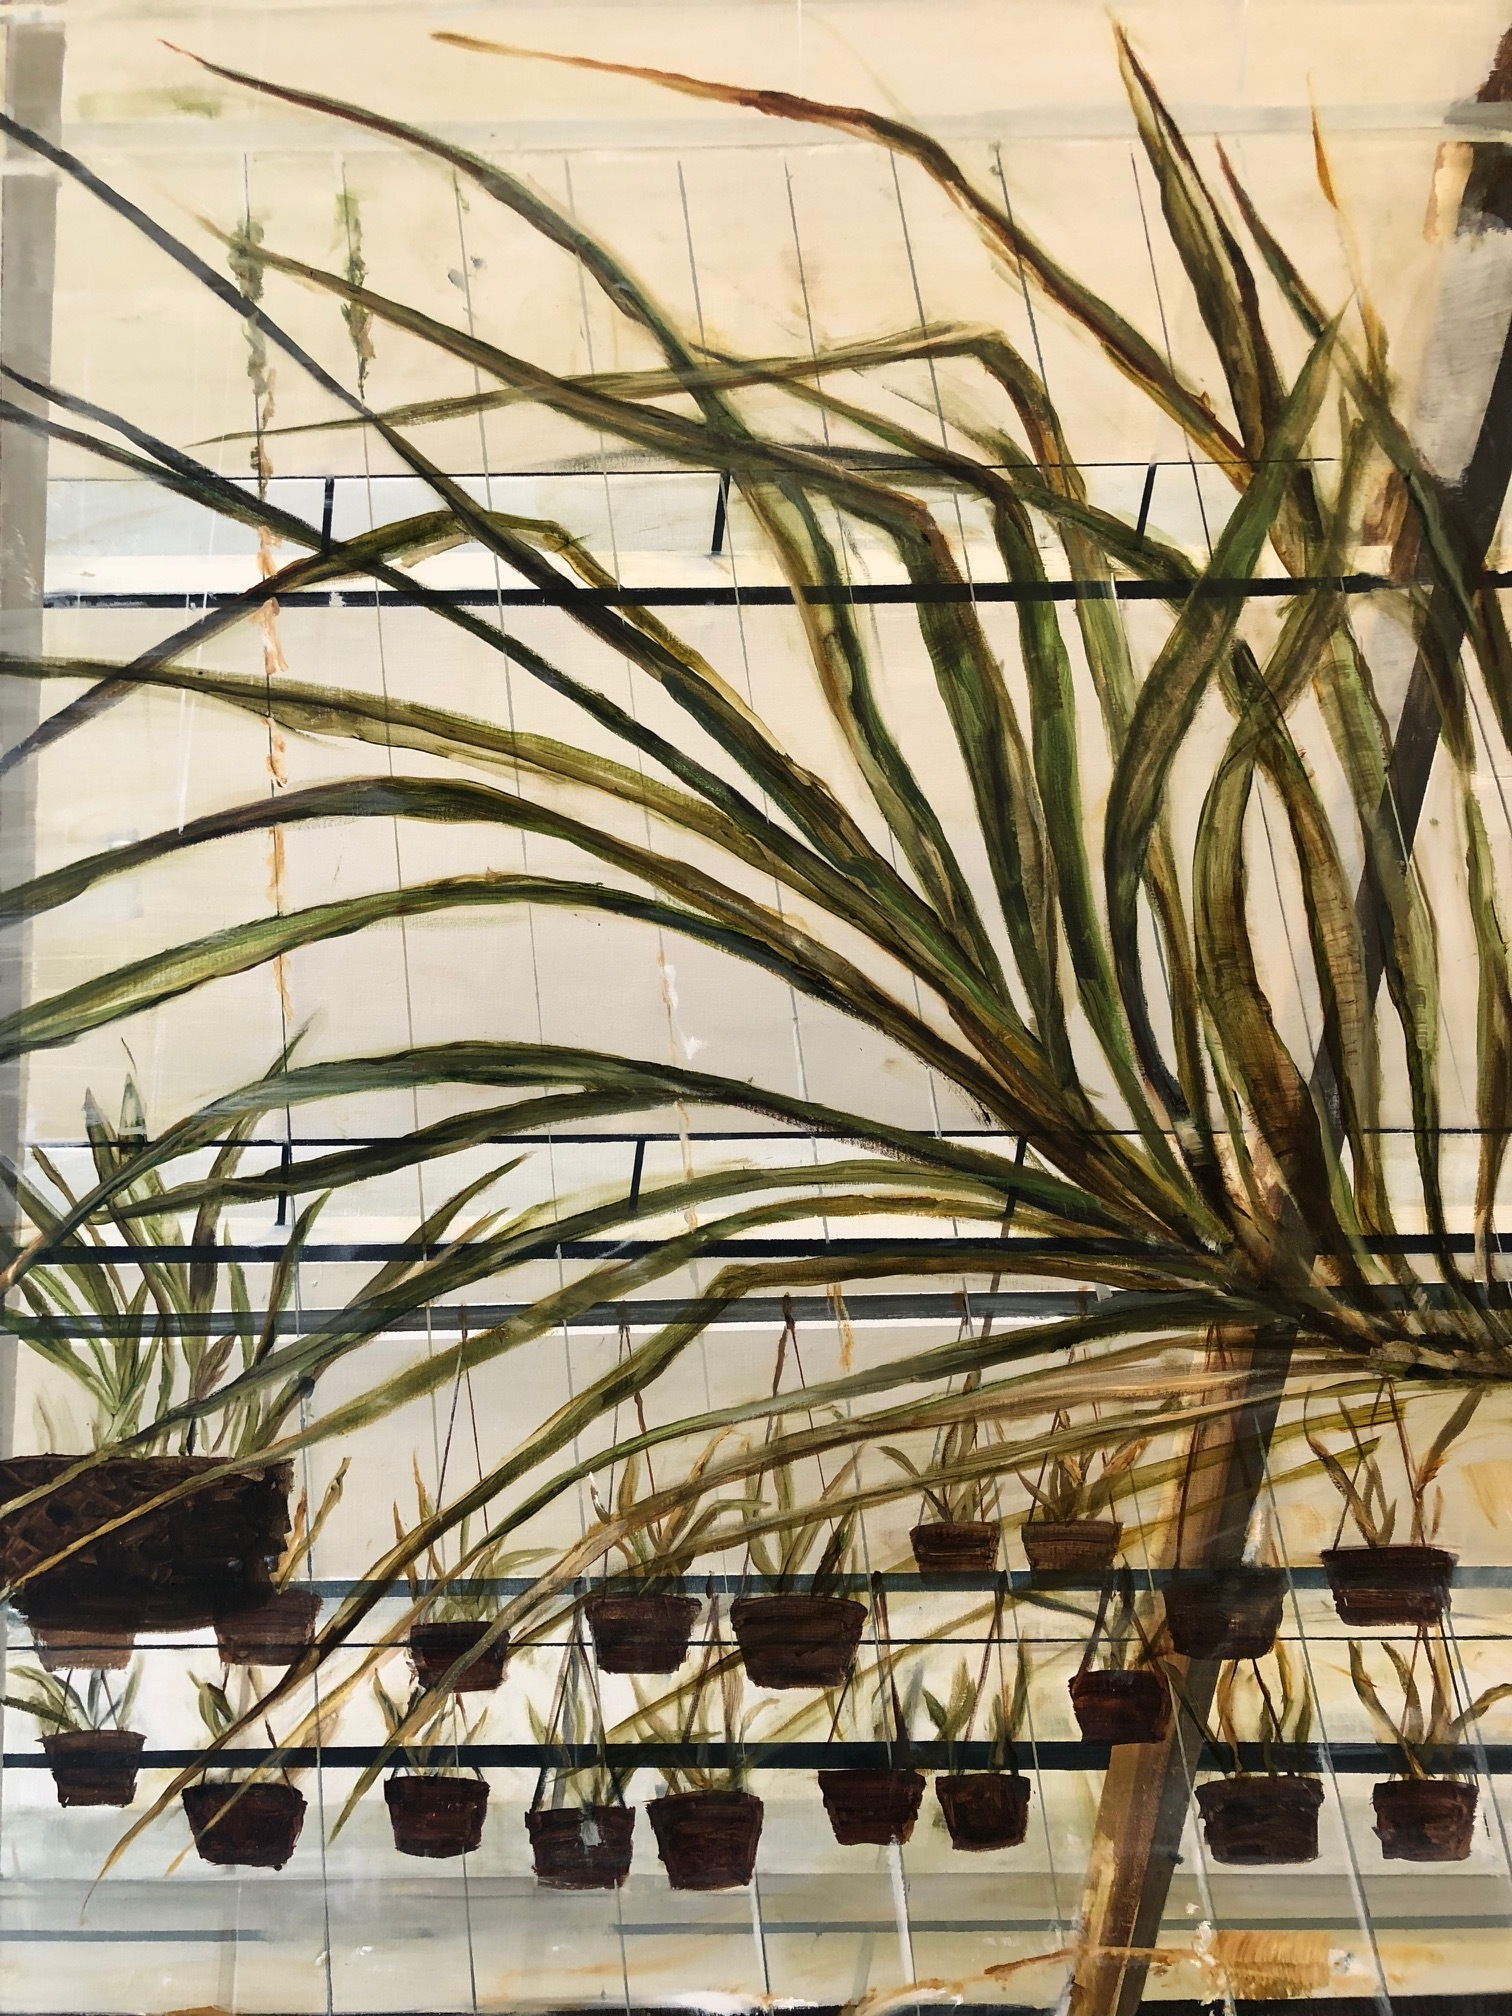 Carla Klein at Tanya Bonakdar Gallery